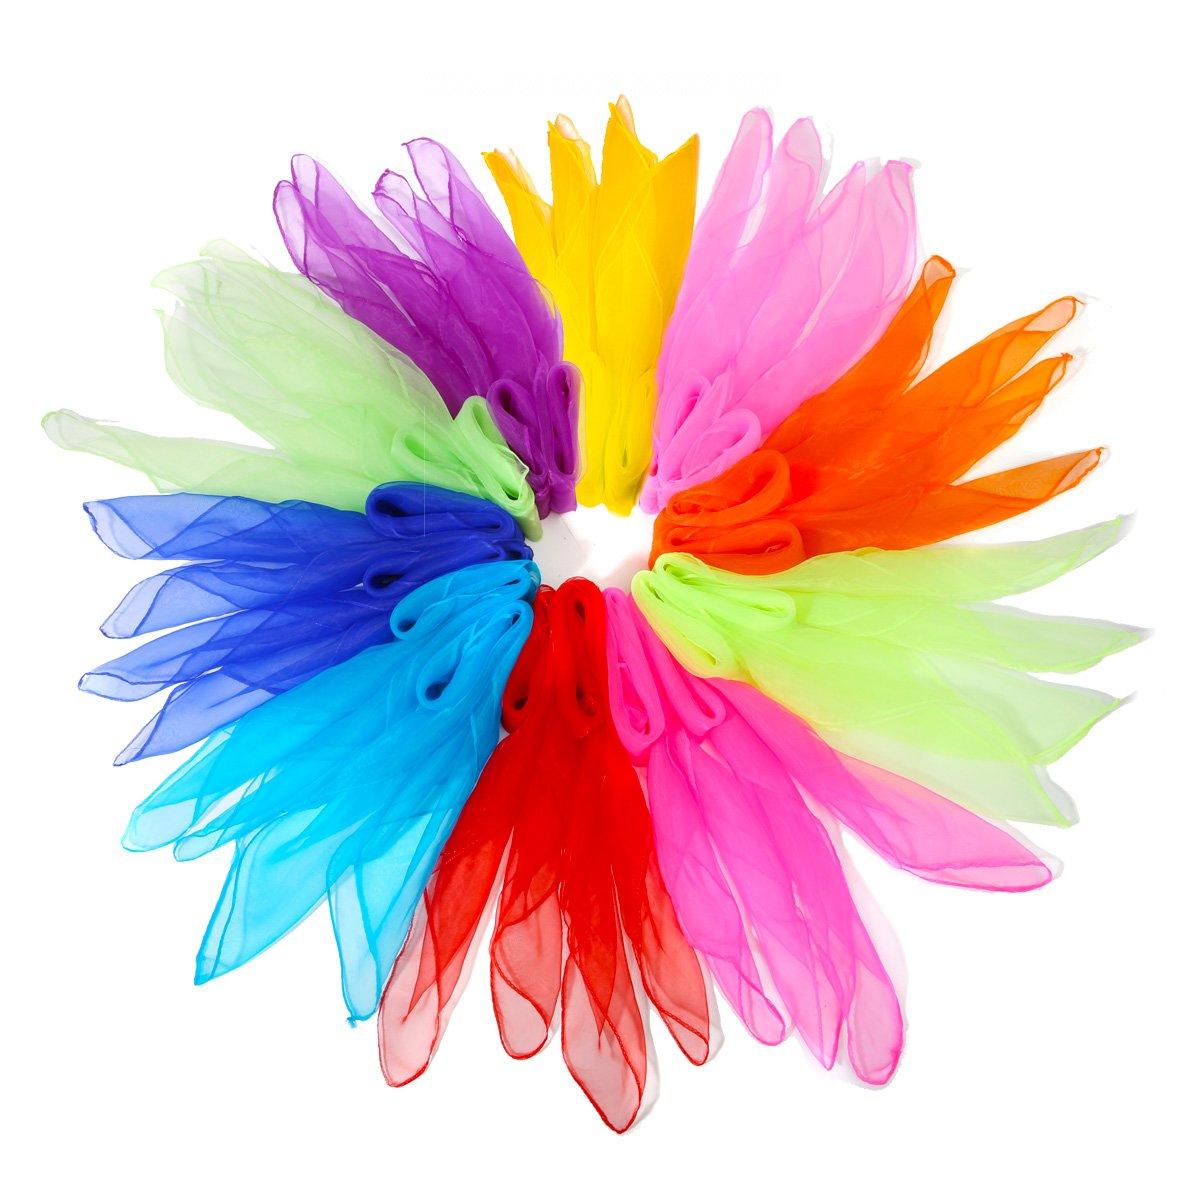 Dance Scarves,NASUM 20pcs Square Juggling Silk Dance Scarves Movement Scarves Magic Tricks Performance Props Accessories ,Random Color Delivery by NASUM